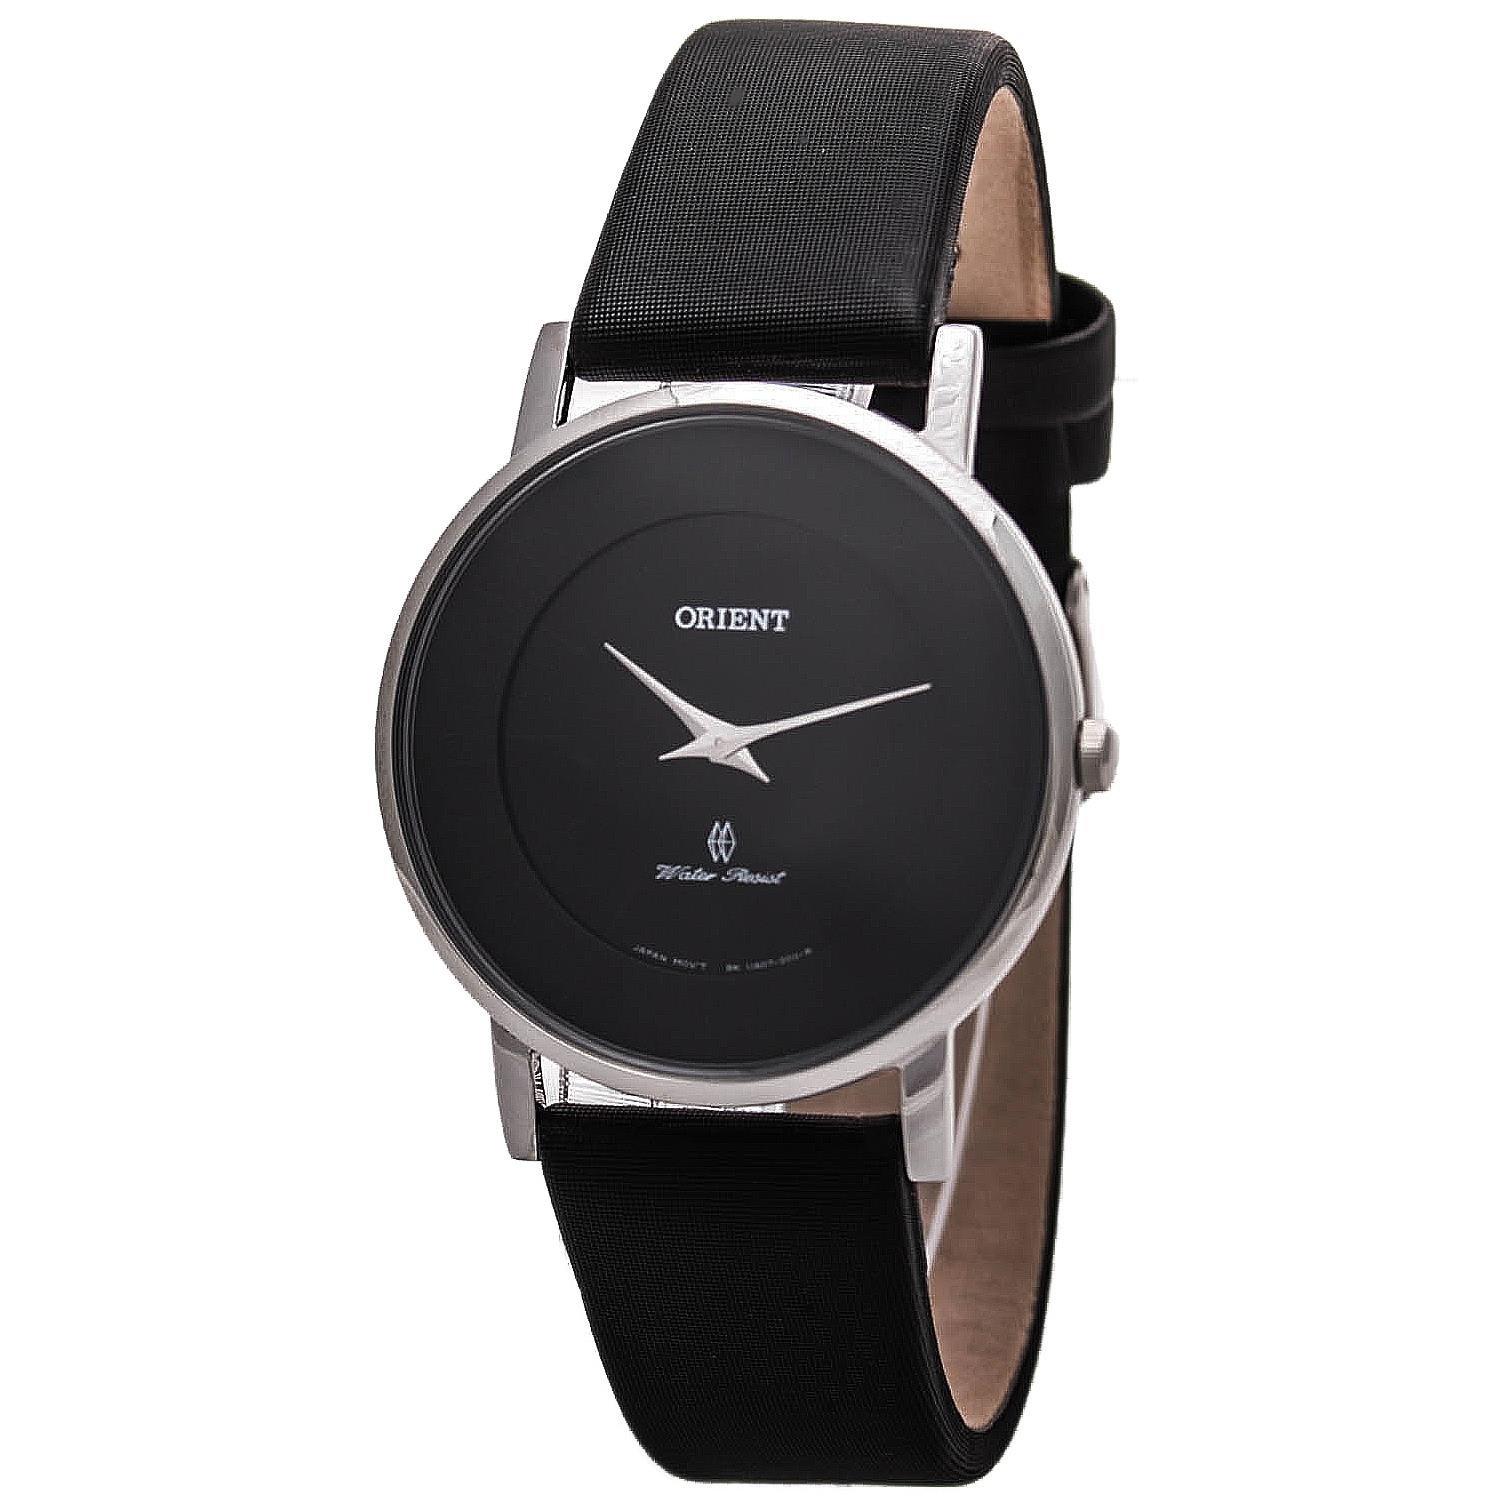 Amazon.com: ORIENT WOMENS 35MM BLACK LEATHER BAND STEEL CASE QUARTZ WATCH FUA07005B0: Orient: Watches